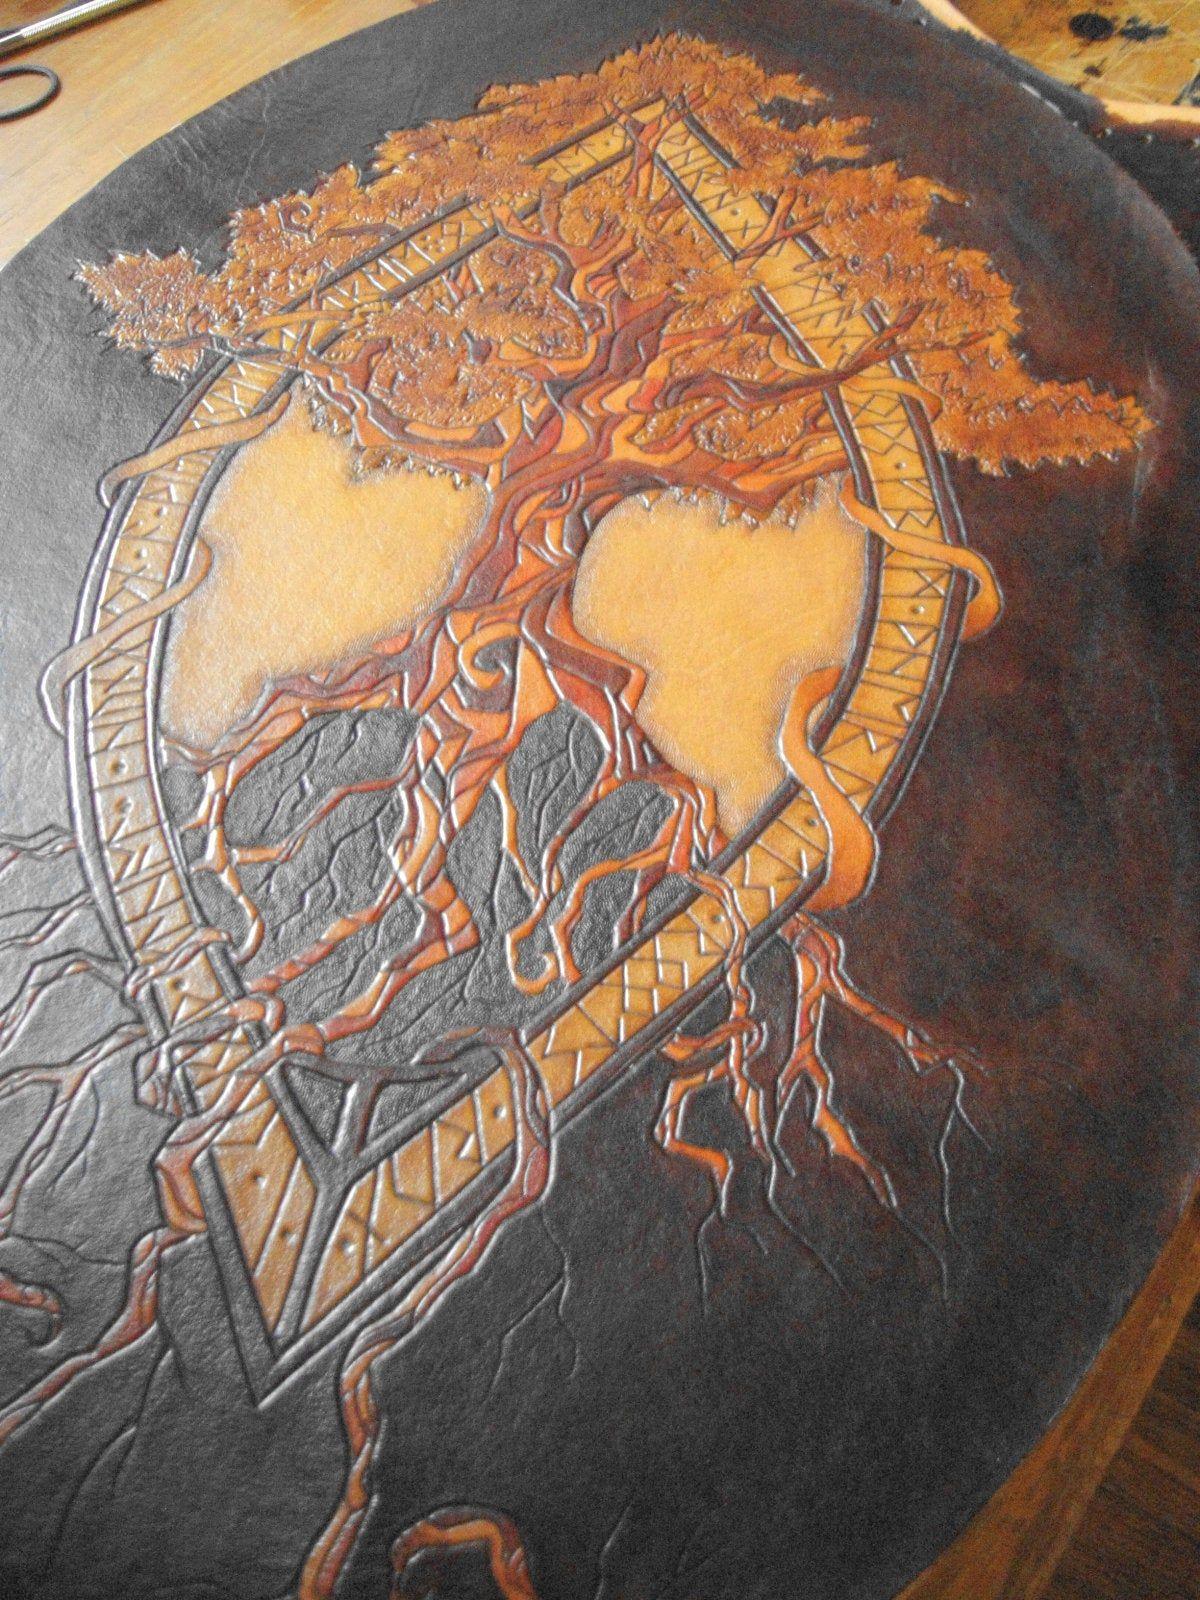 Yggdrasil In Bowed Antique Frame Antieke Lijsten Een Tatoeage Krijgen Een Tatoeage